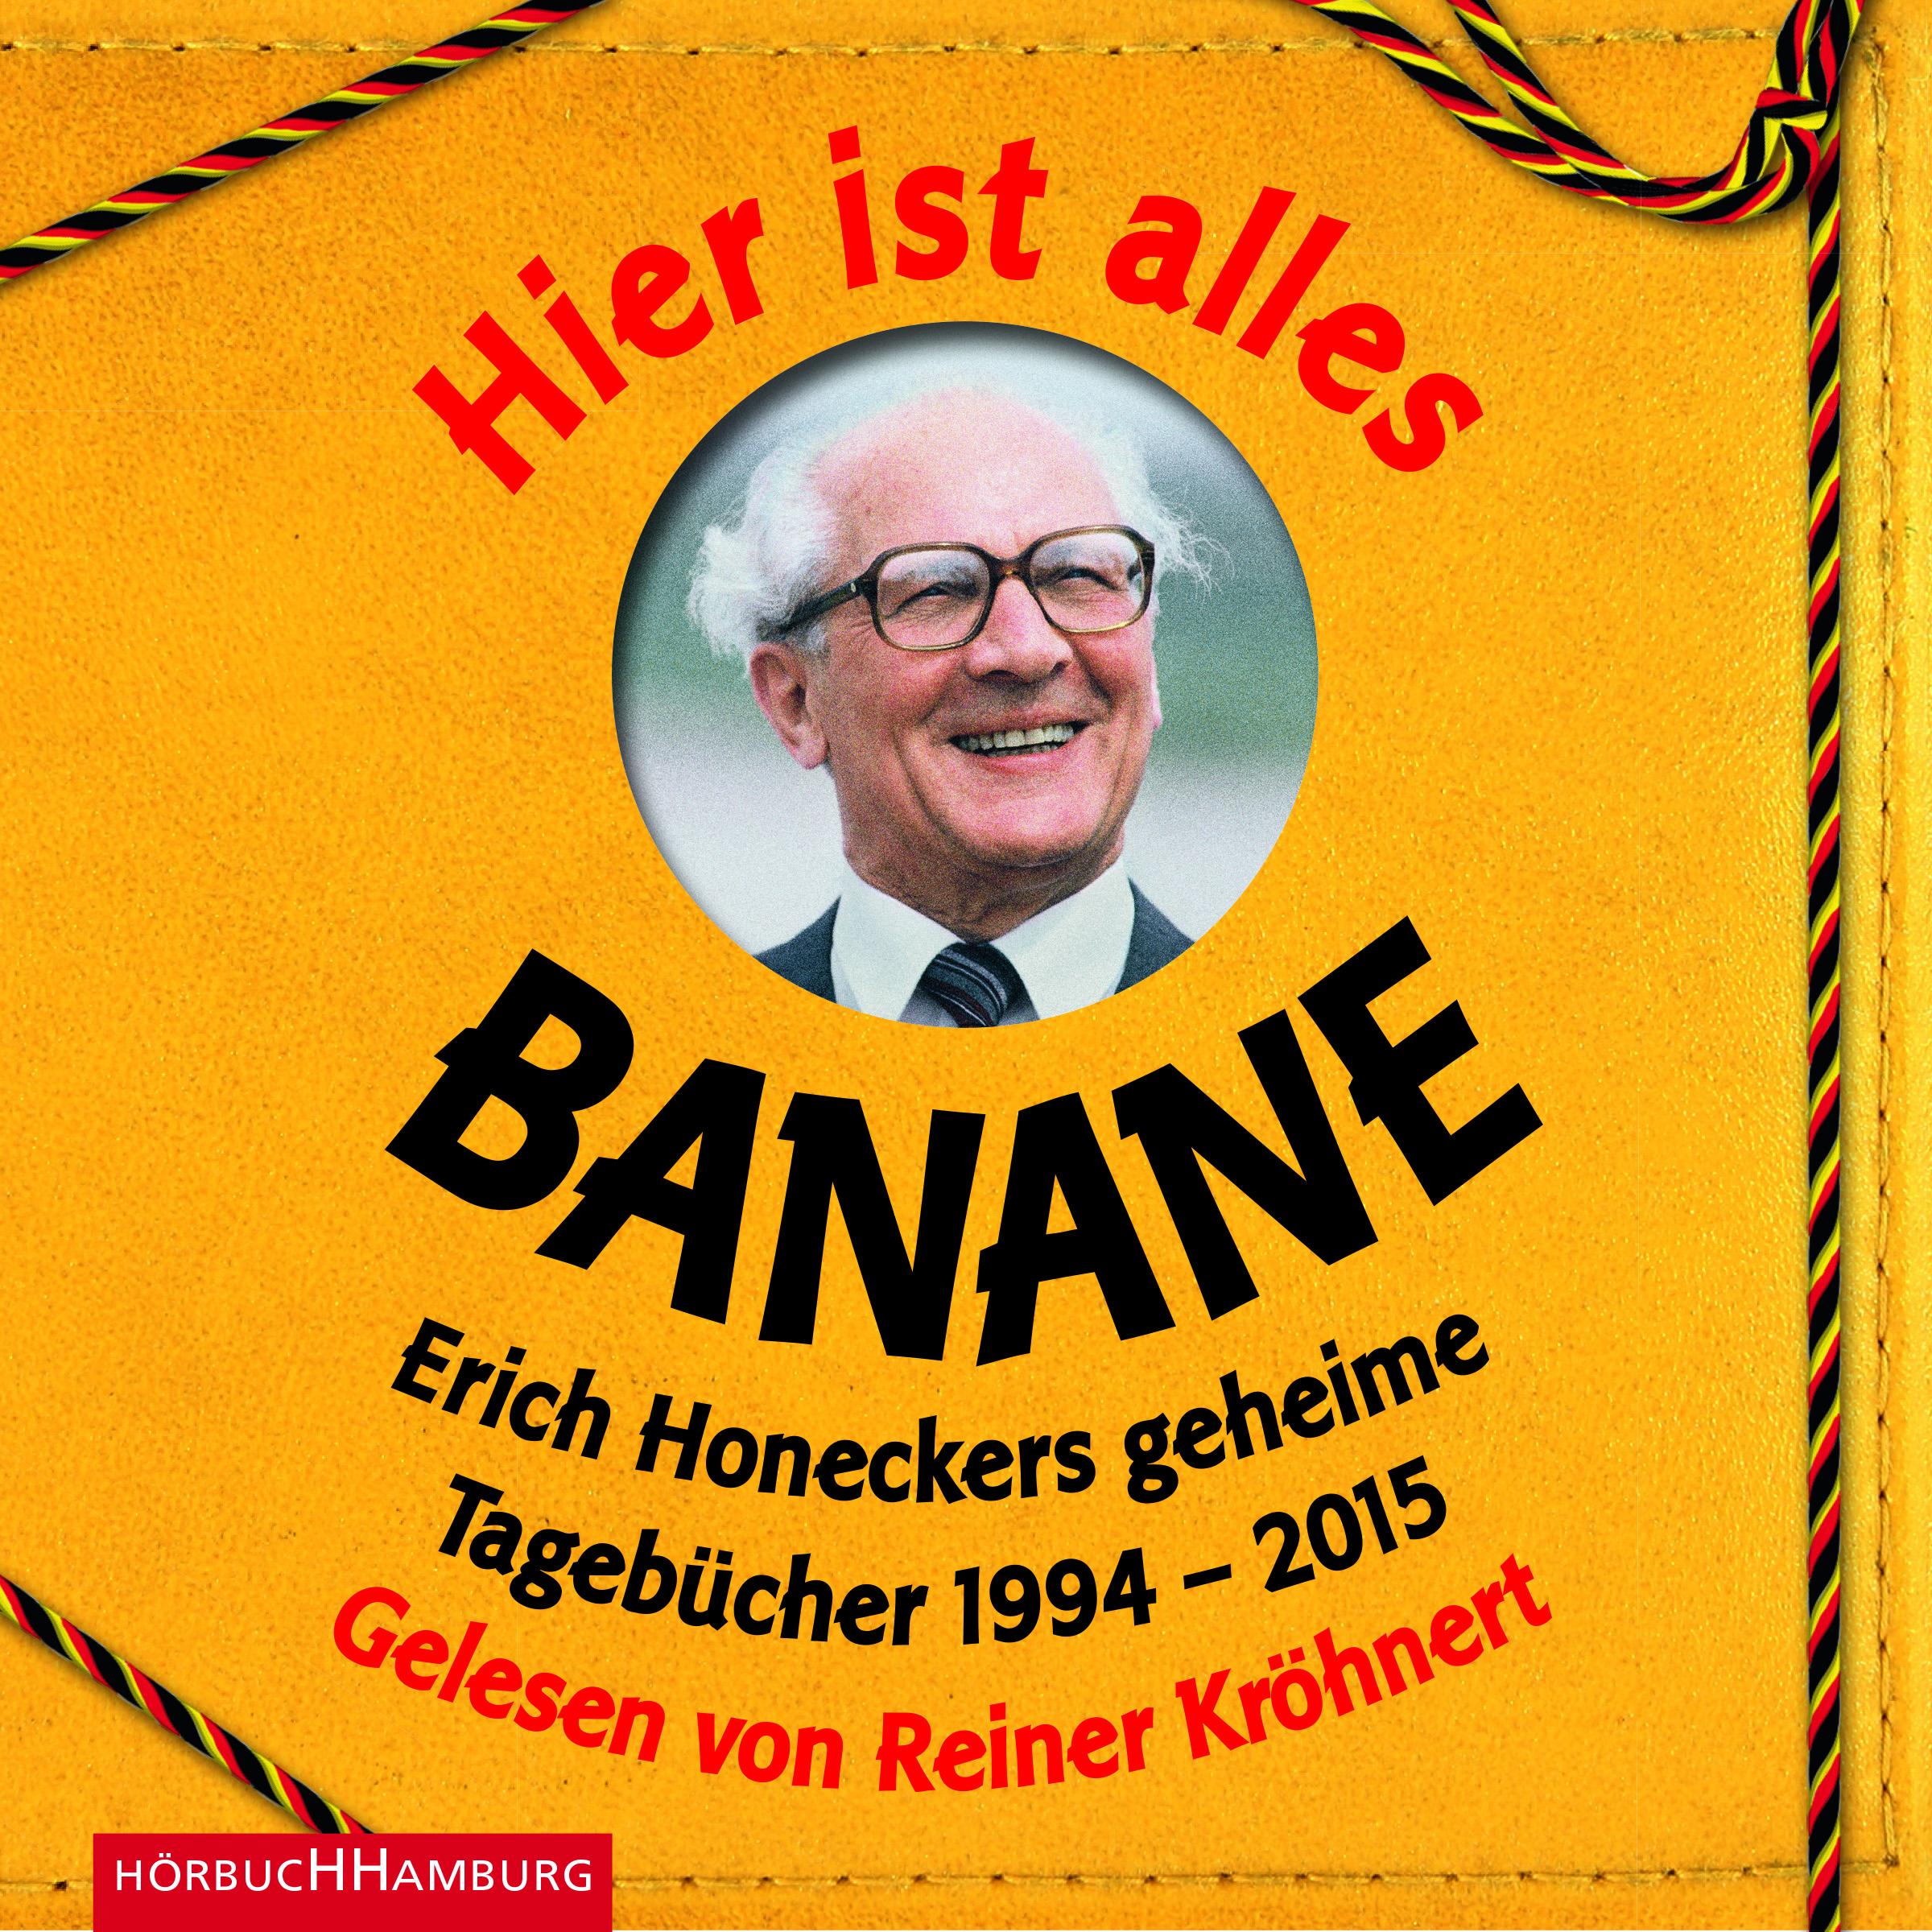 Cover für das Hier ist alles Banane Hörbuch